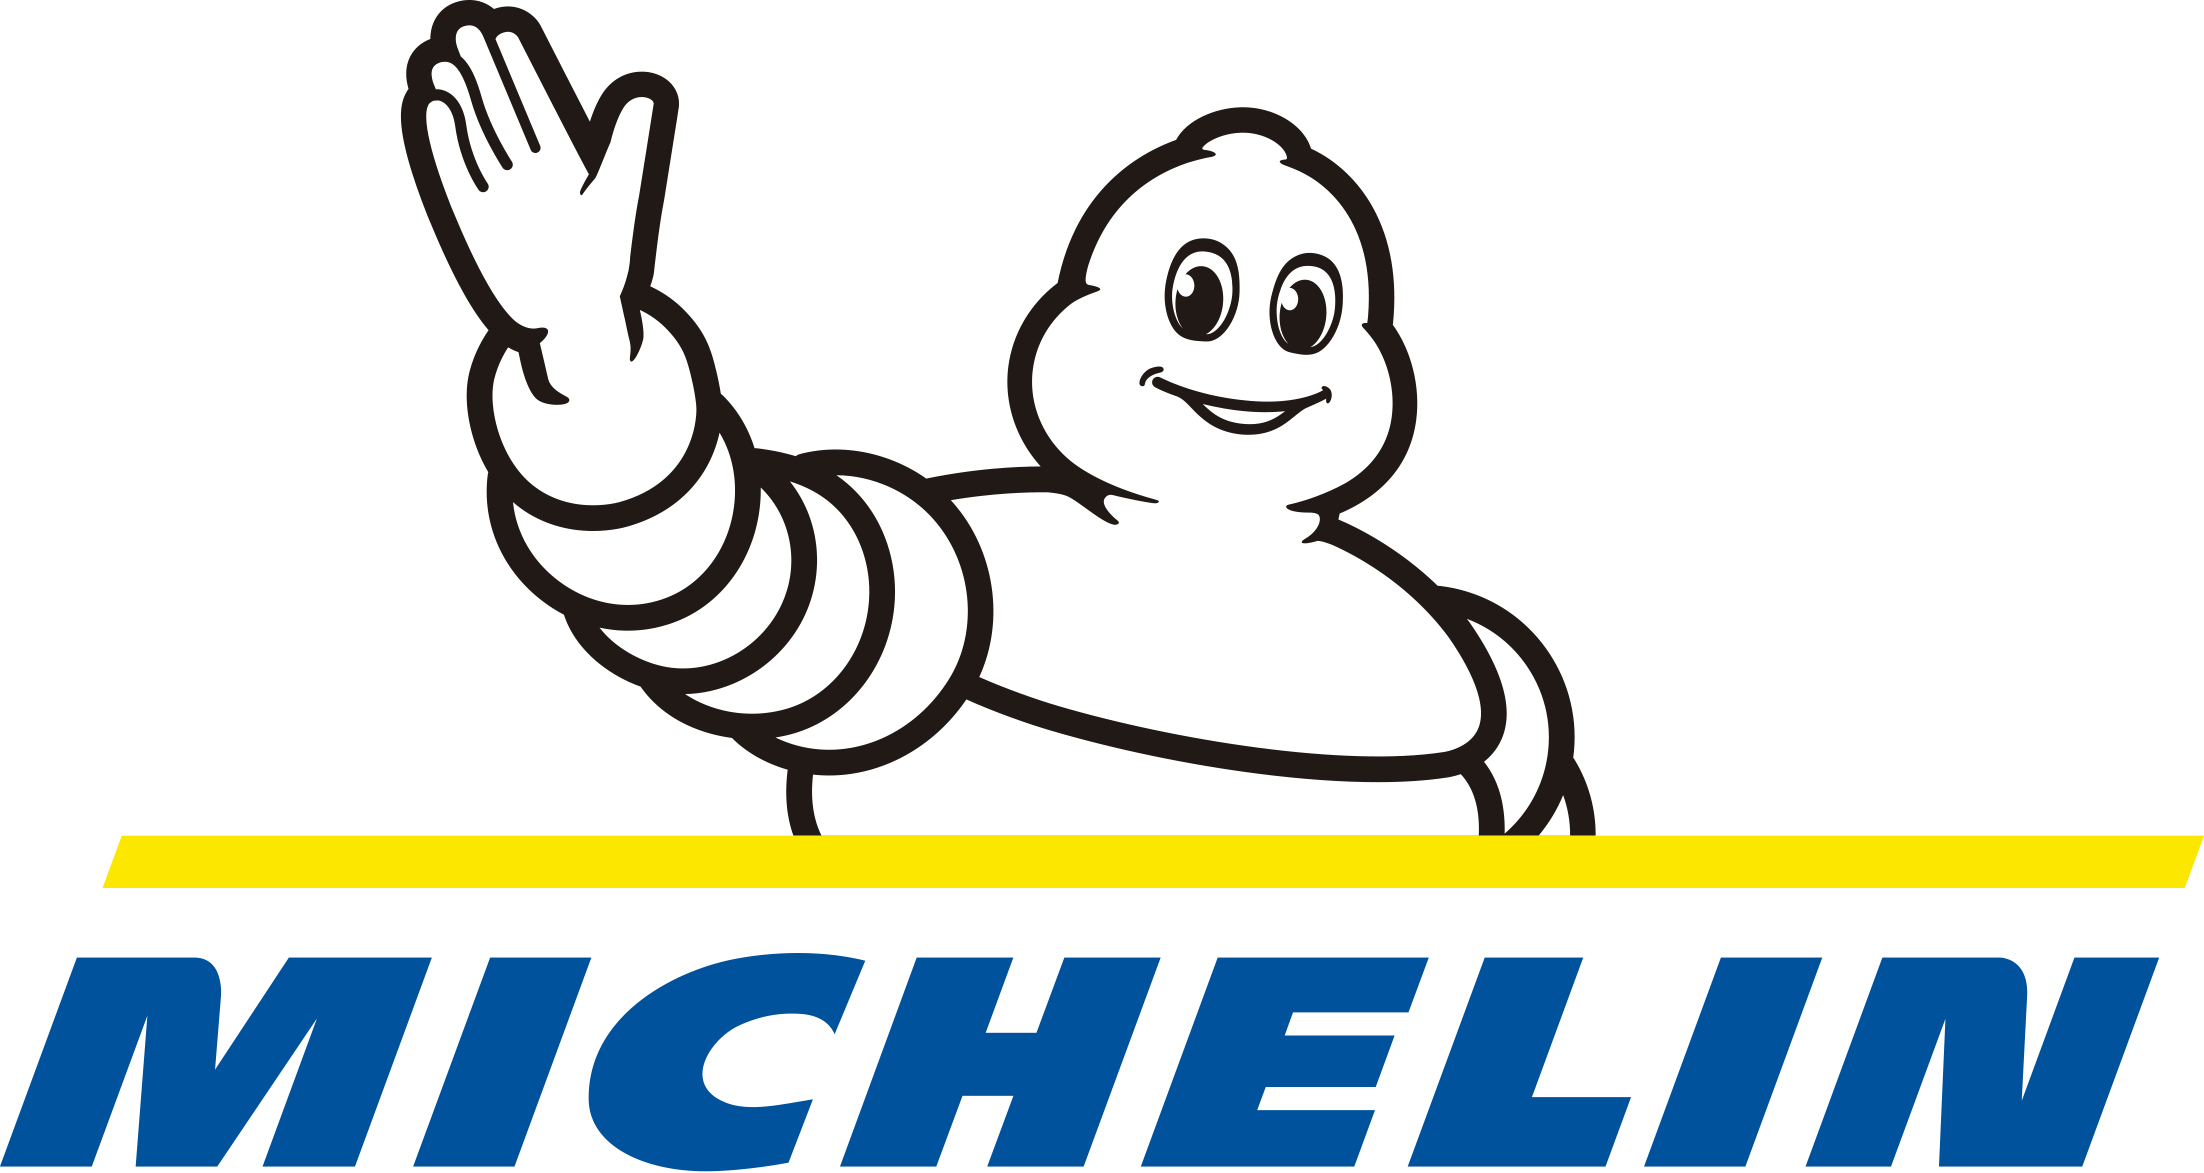 Michelin has renewed its logo.